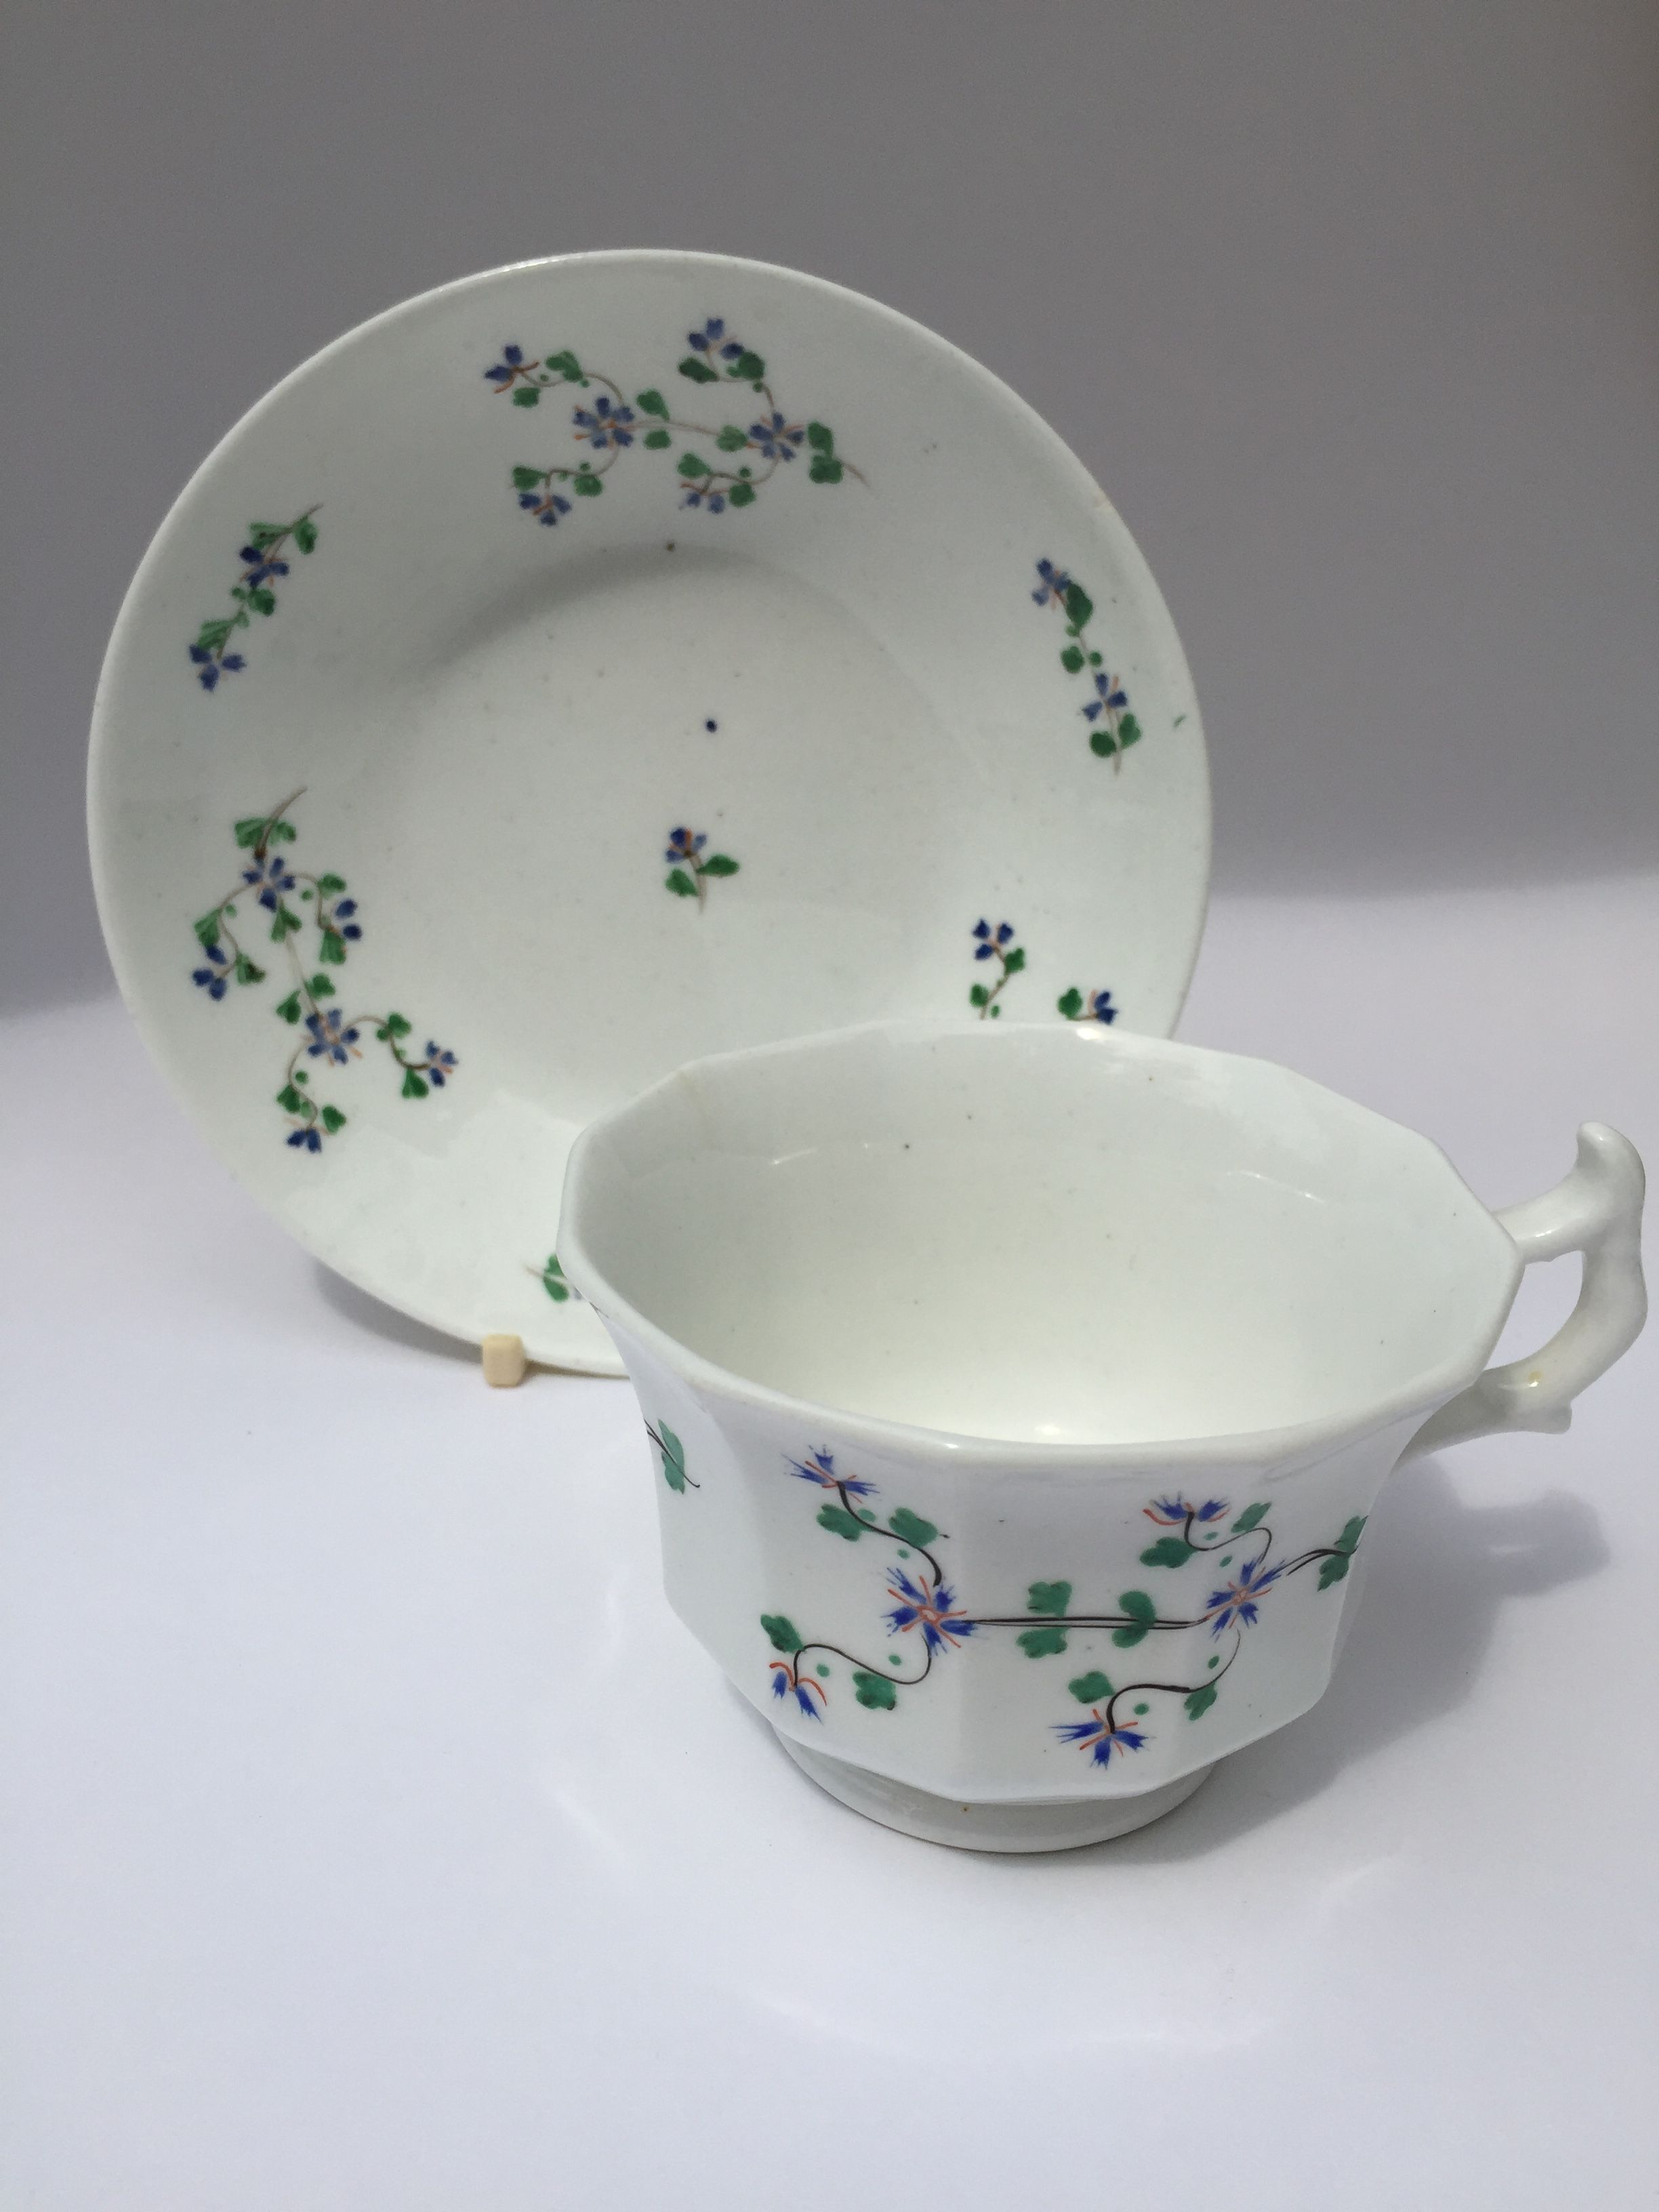 Staffordshire Sprigware Vintage China Staffordshire English China